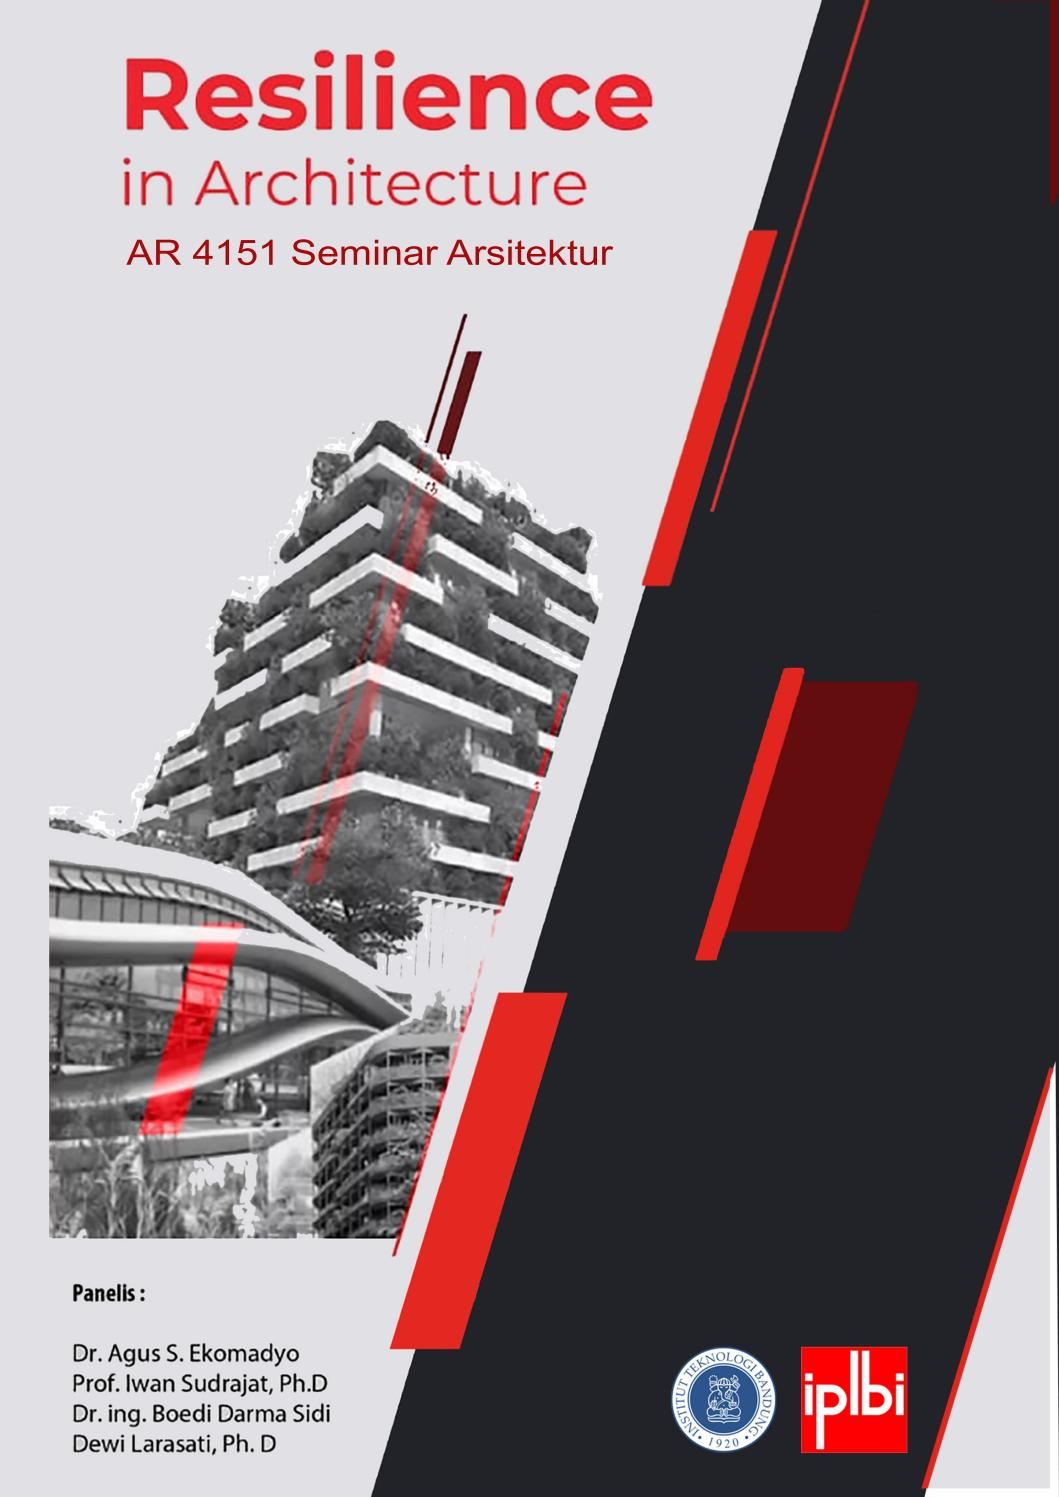 Ar4151 Seminar Arsitektur Semester I 2018 2019 By Unit Publikasi Program Studi Arsitektur Itb Issuu